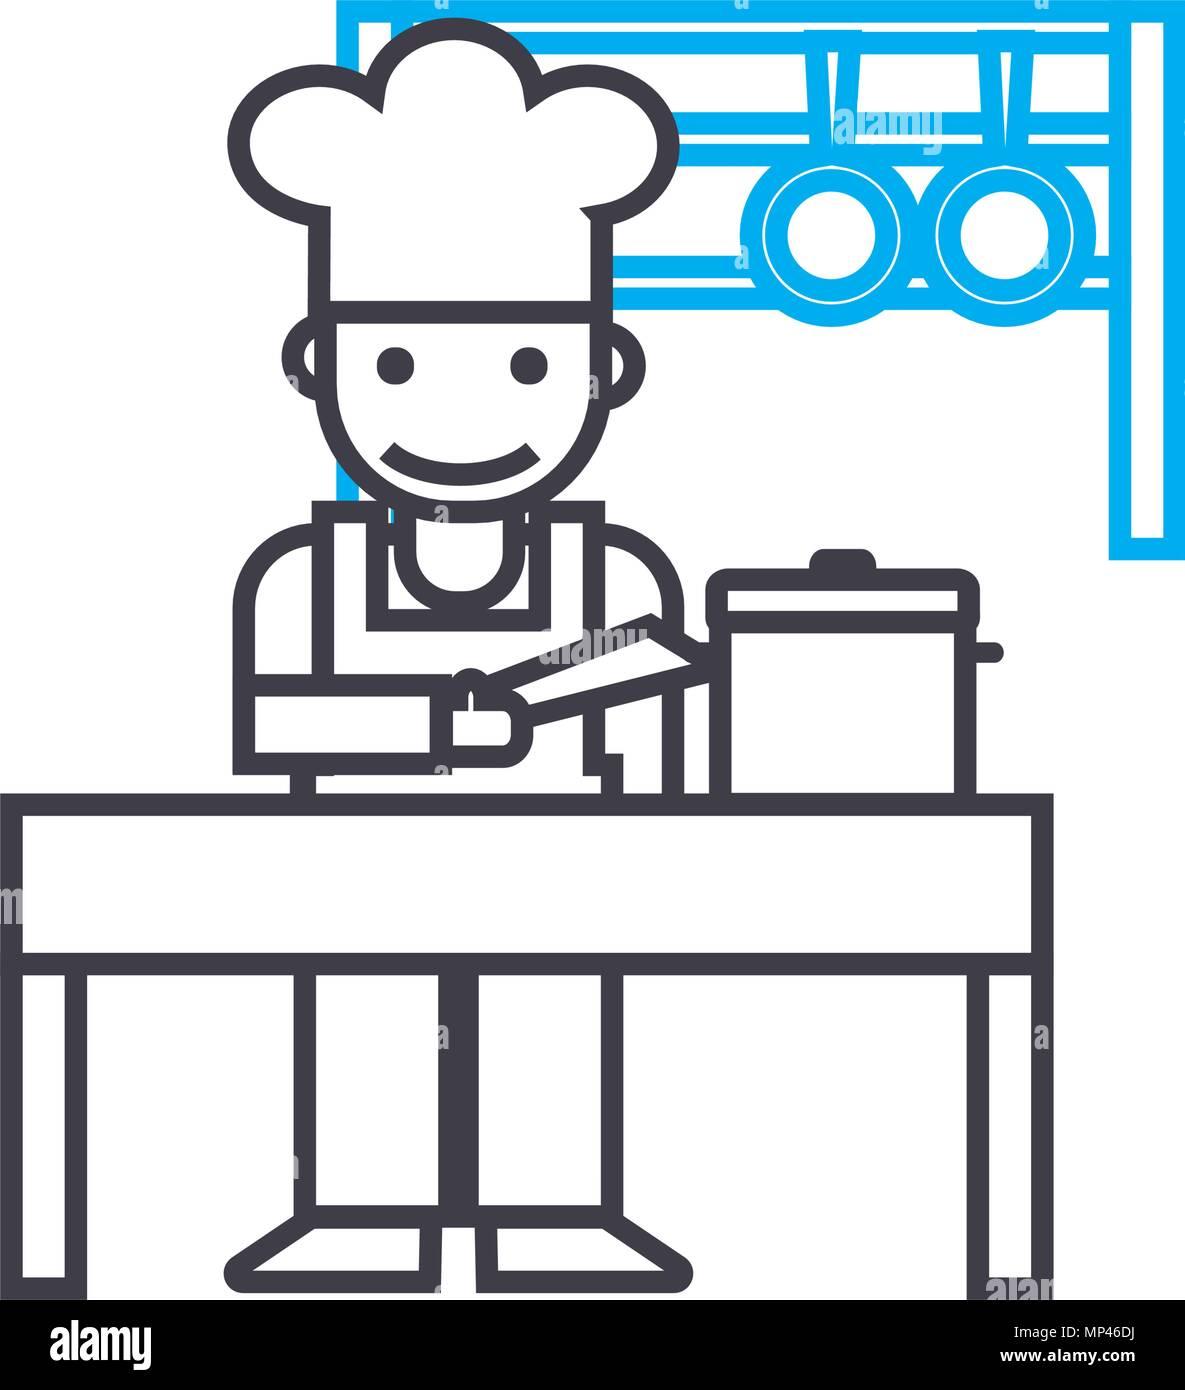 Küche Personal lineare Symbol Konzept. Küche Personal line Vektor